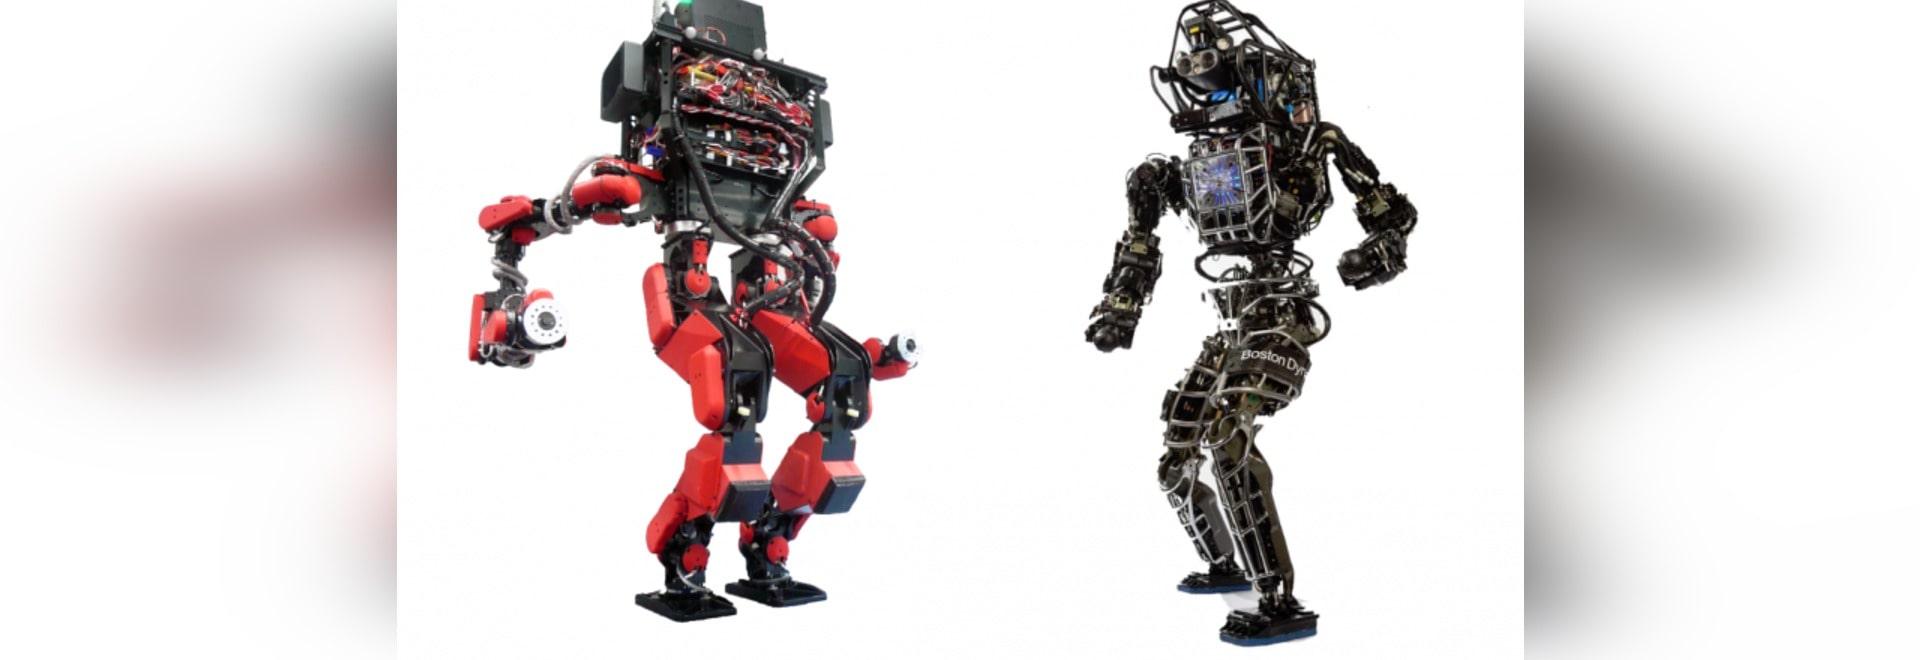 LES ROBOTS DE GOOGLE-OWNED DOMINENT LES ÉPREUVES 2014 DE DÉFI DE ROBOTIQUE DE DARPA